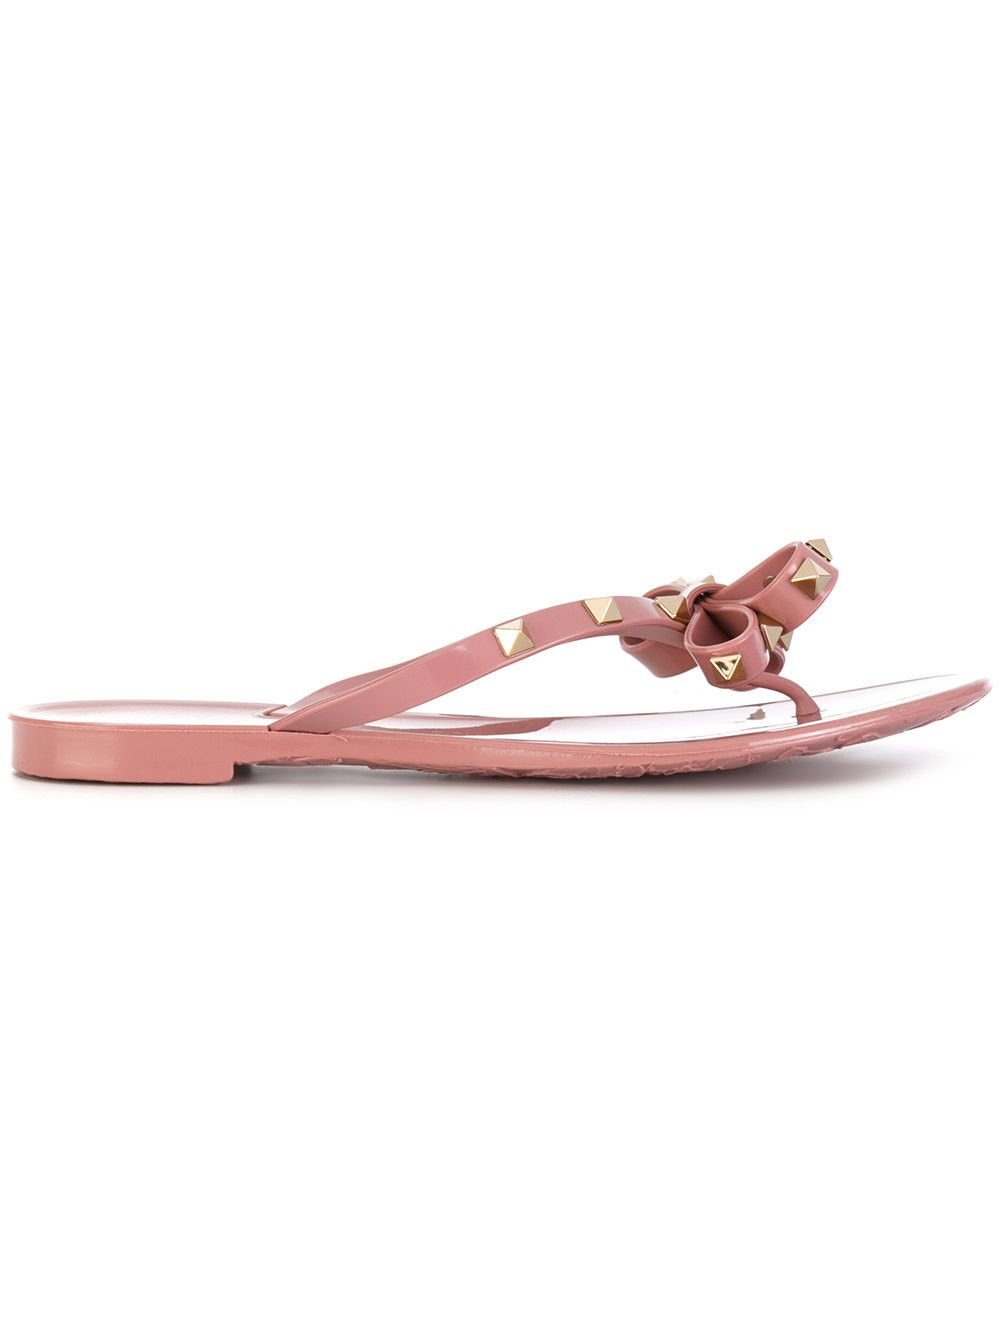 70165d661558 VALENTINO Valentino Rockstud Flip Flops.  valentino  shoes ...